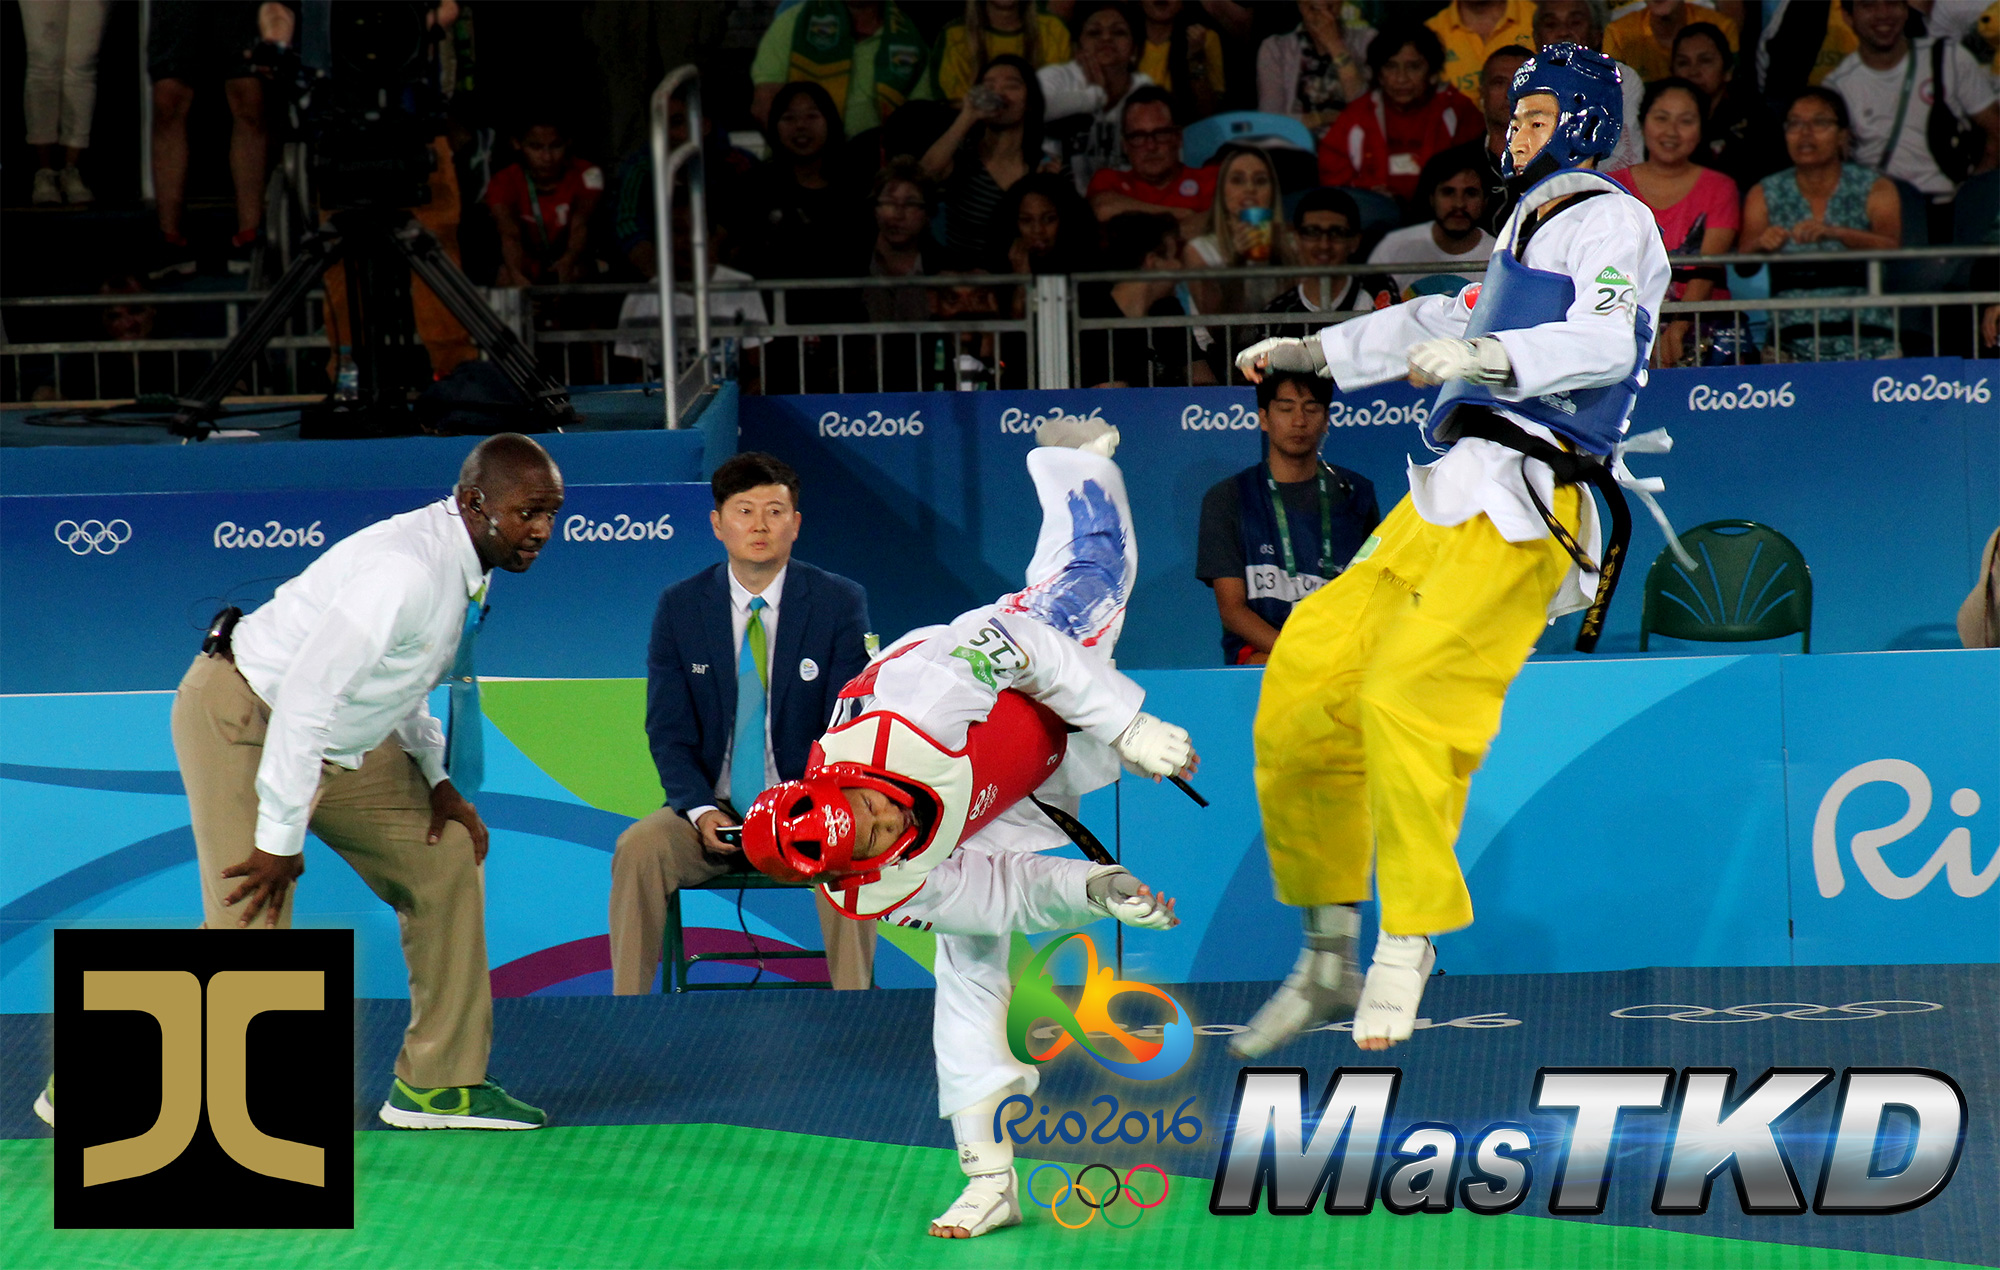 20160817_Taekwondo_JC_masTKD_Rio2016_07